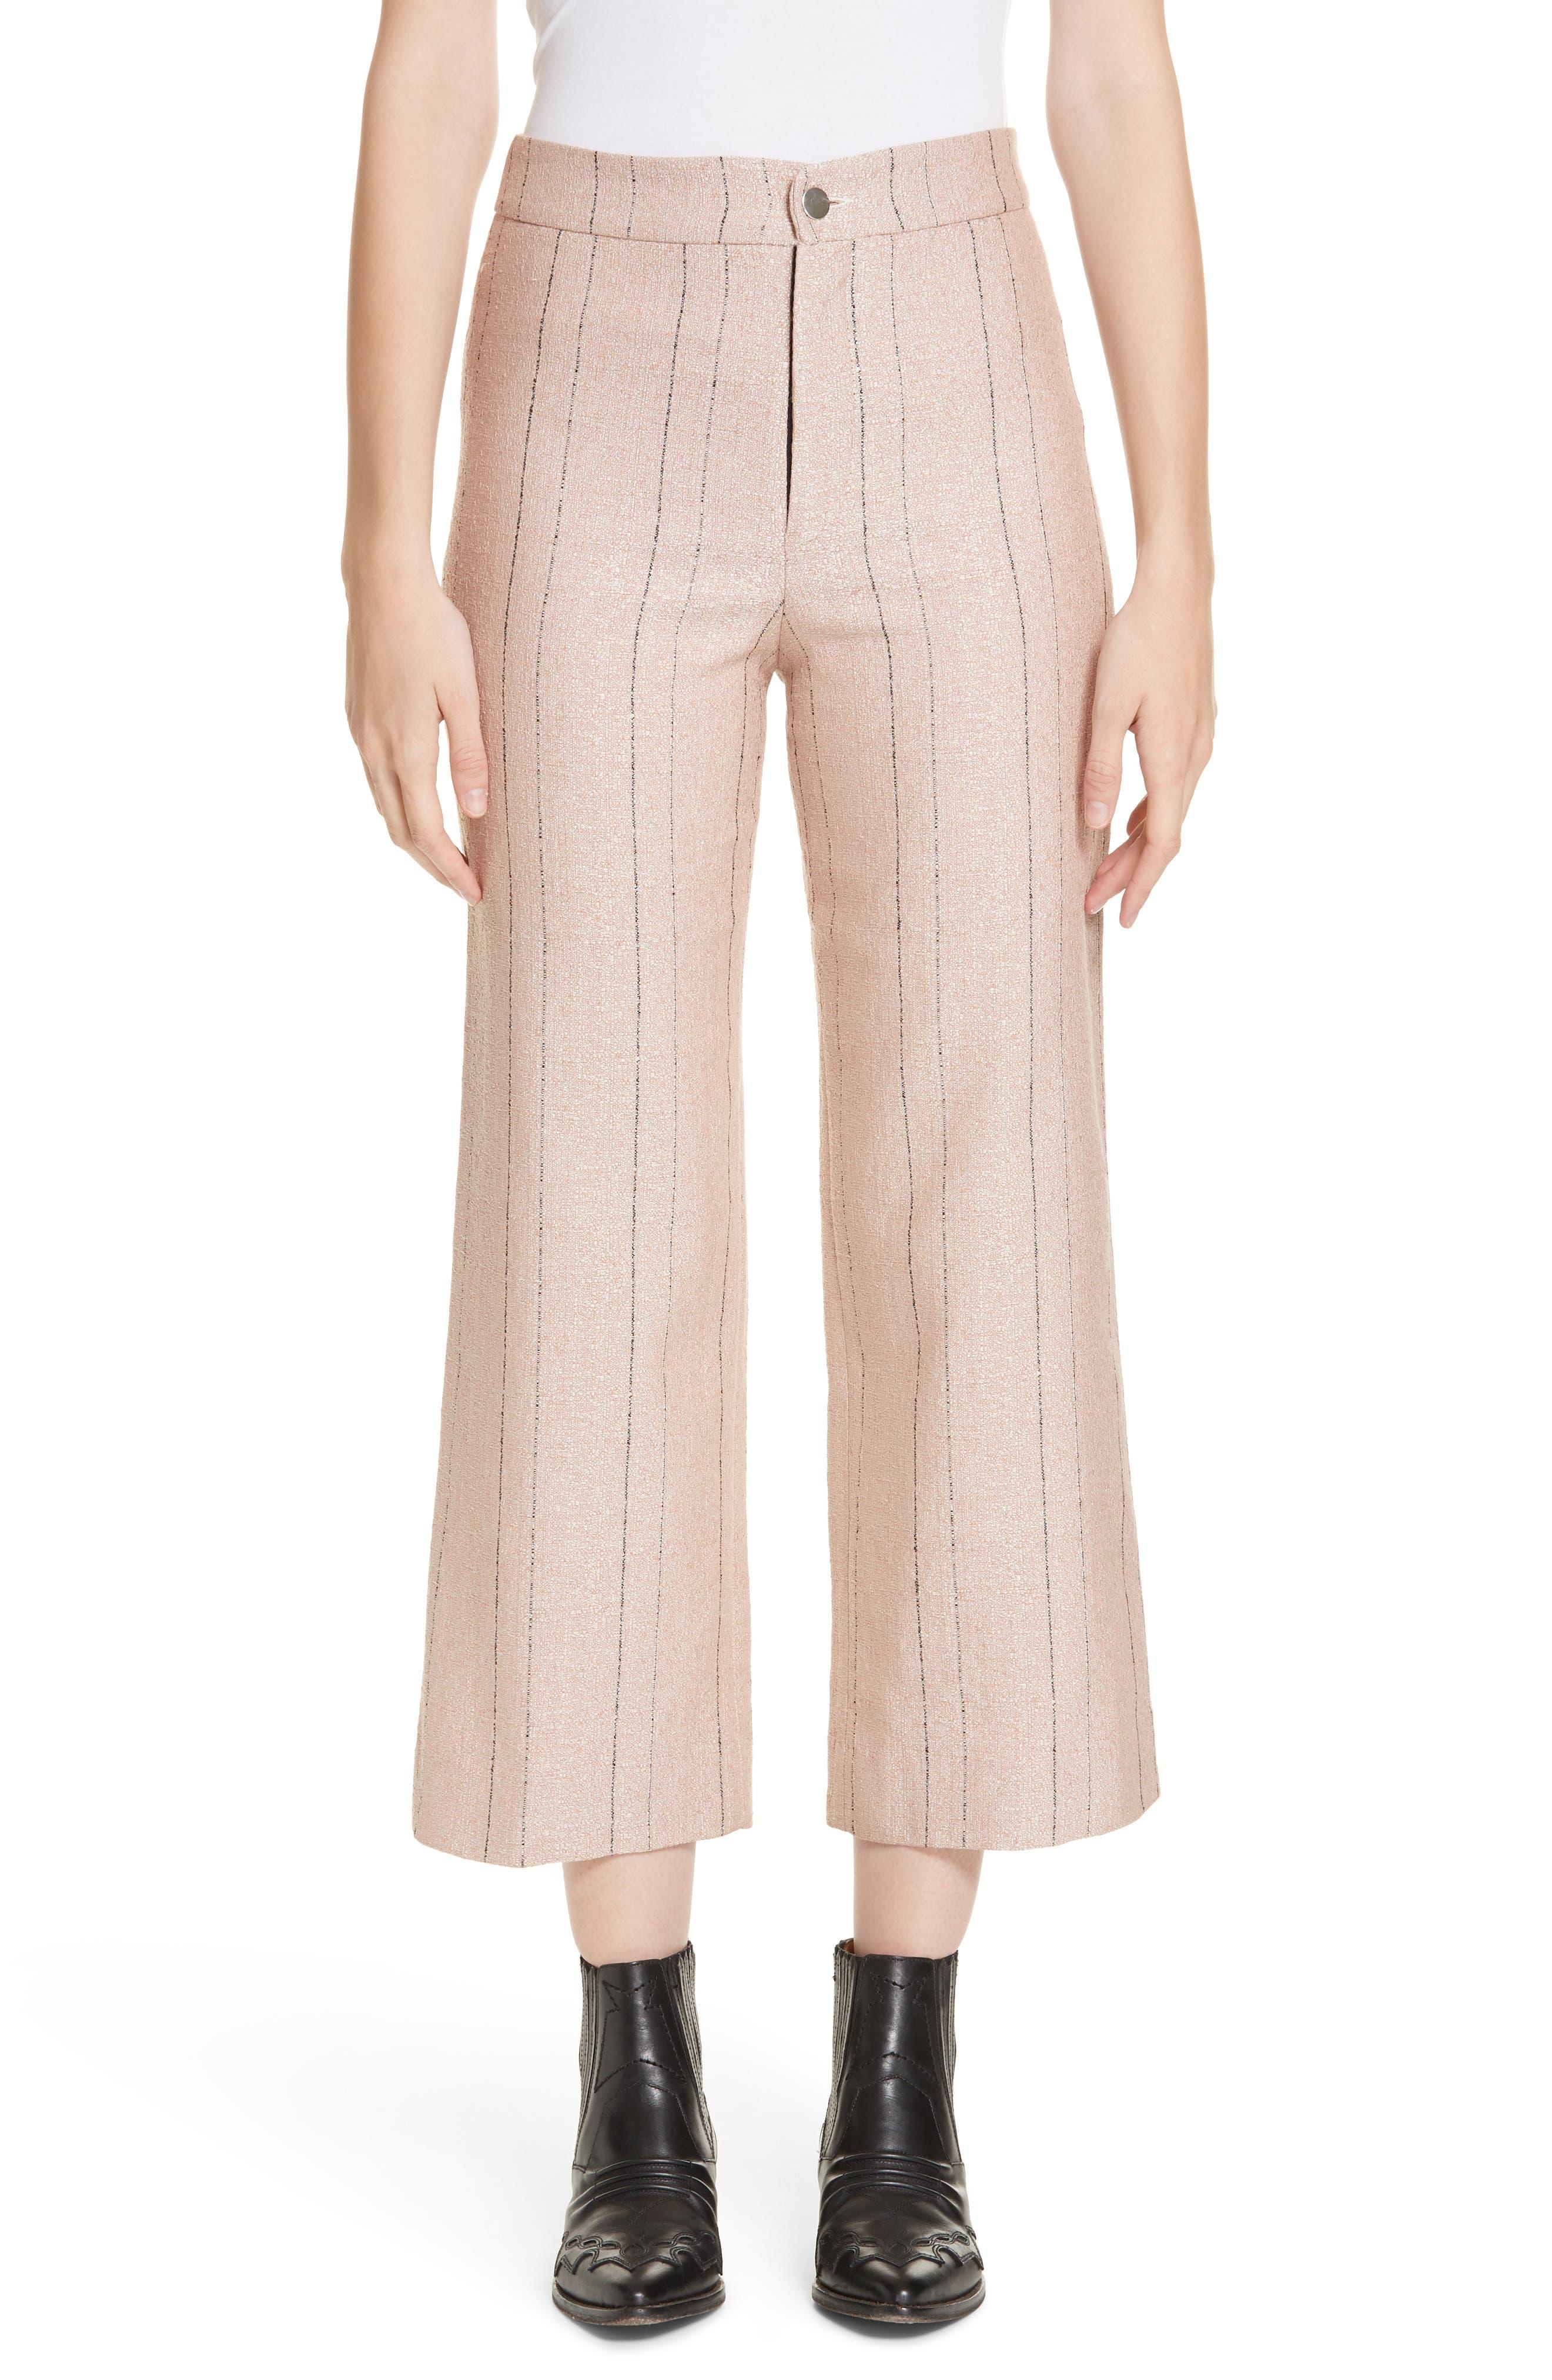 ROSEANNA Gang Stripe Pants in Poudre